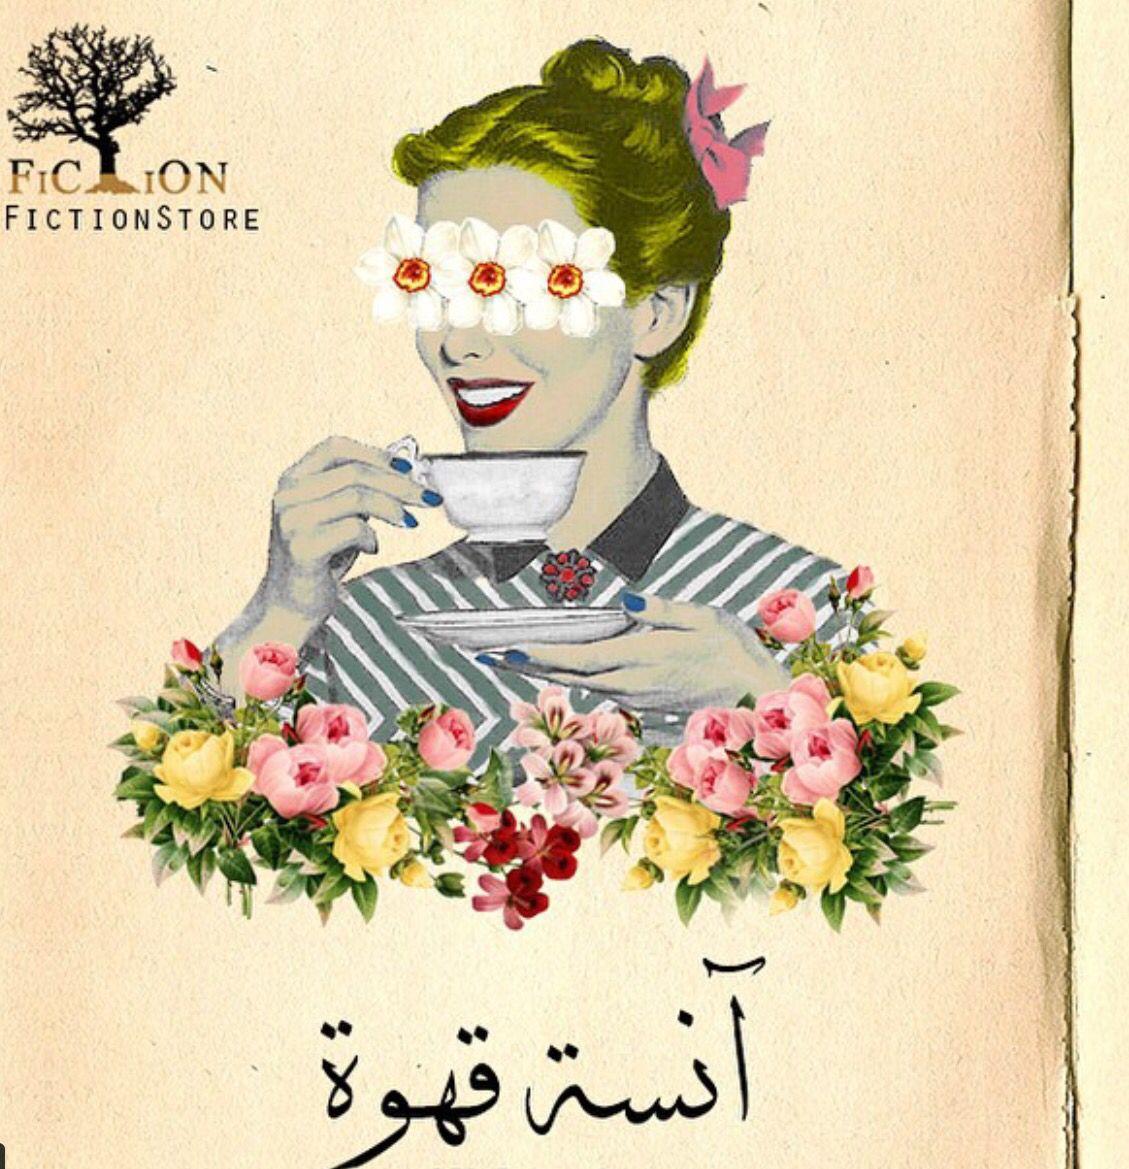 آنسه قهوة Art Funny Art Arabic Art